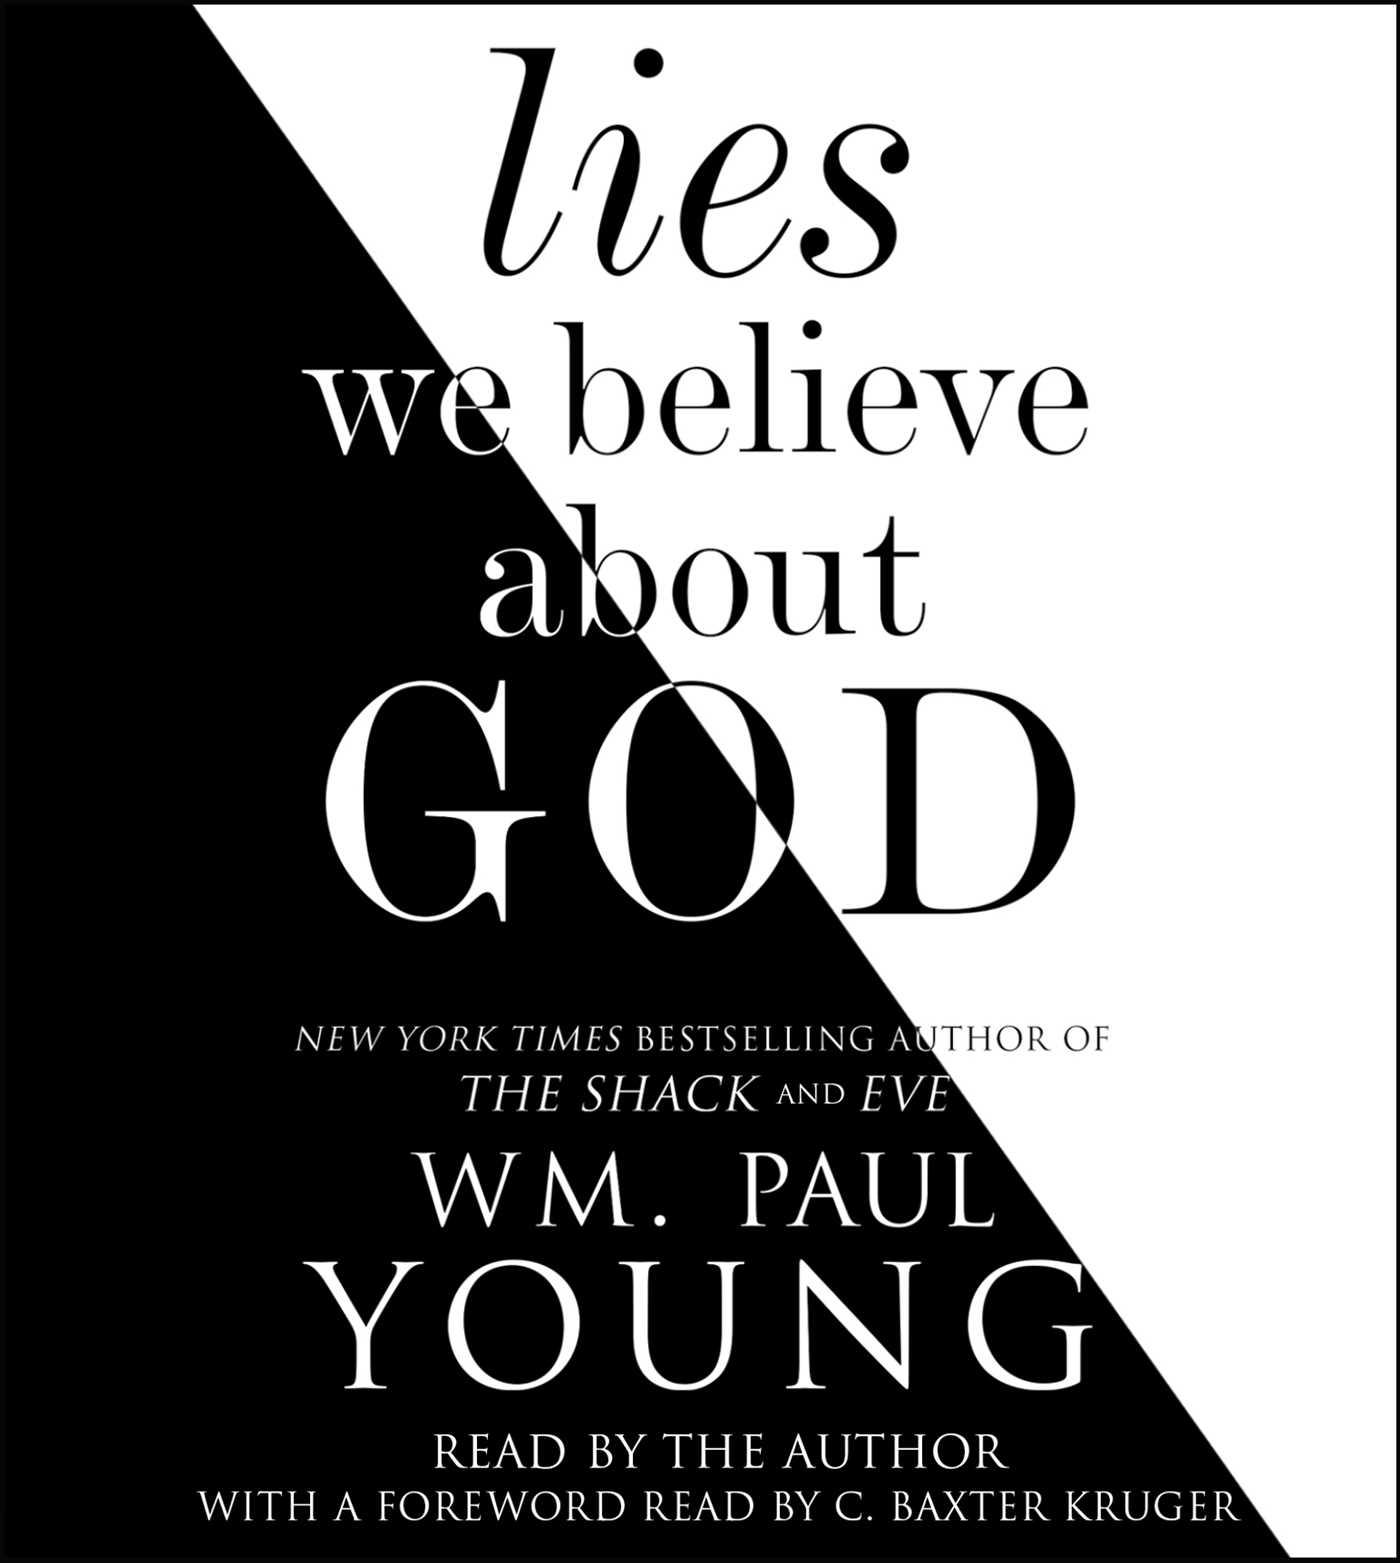 Lies we believe about god 9781508211655 hr